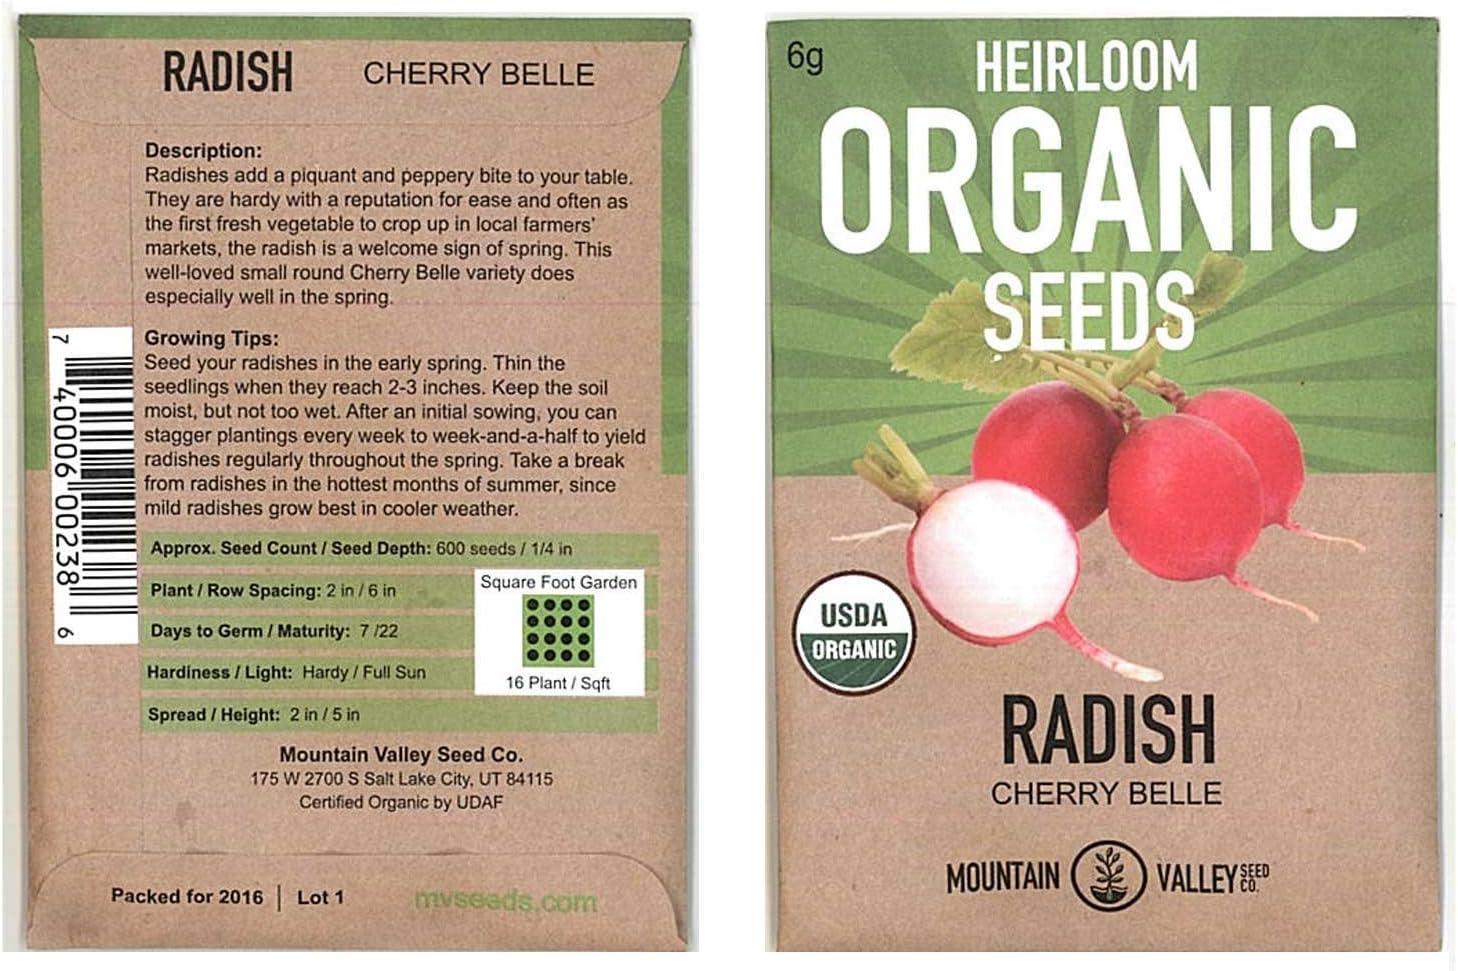 Organic Cherry Belle Radish Seeds - 6 Gram Seed Packet - Heirloom Garden Seeds, Non-GMO, AAS Winner - Vegetable Gardening and Micro Greens